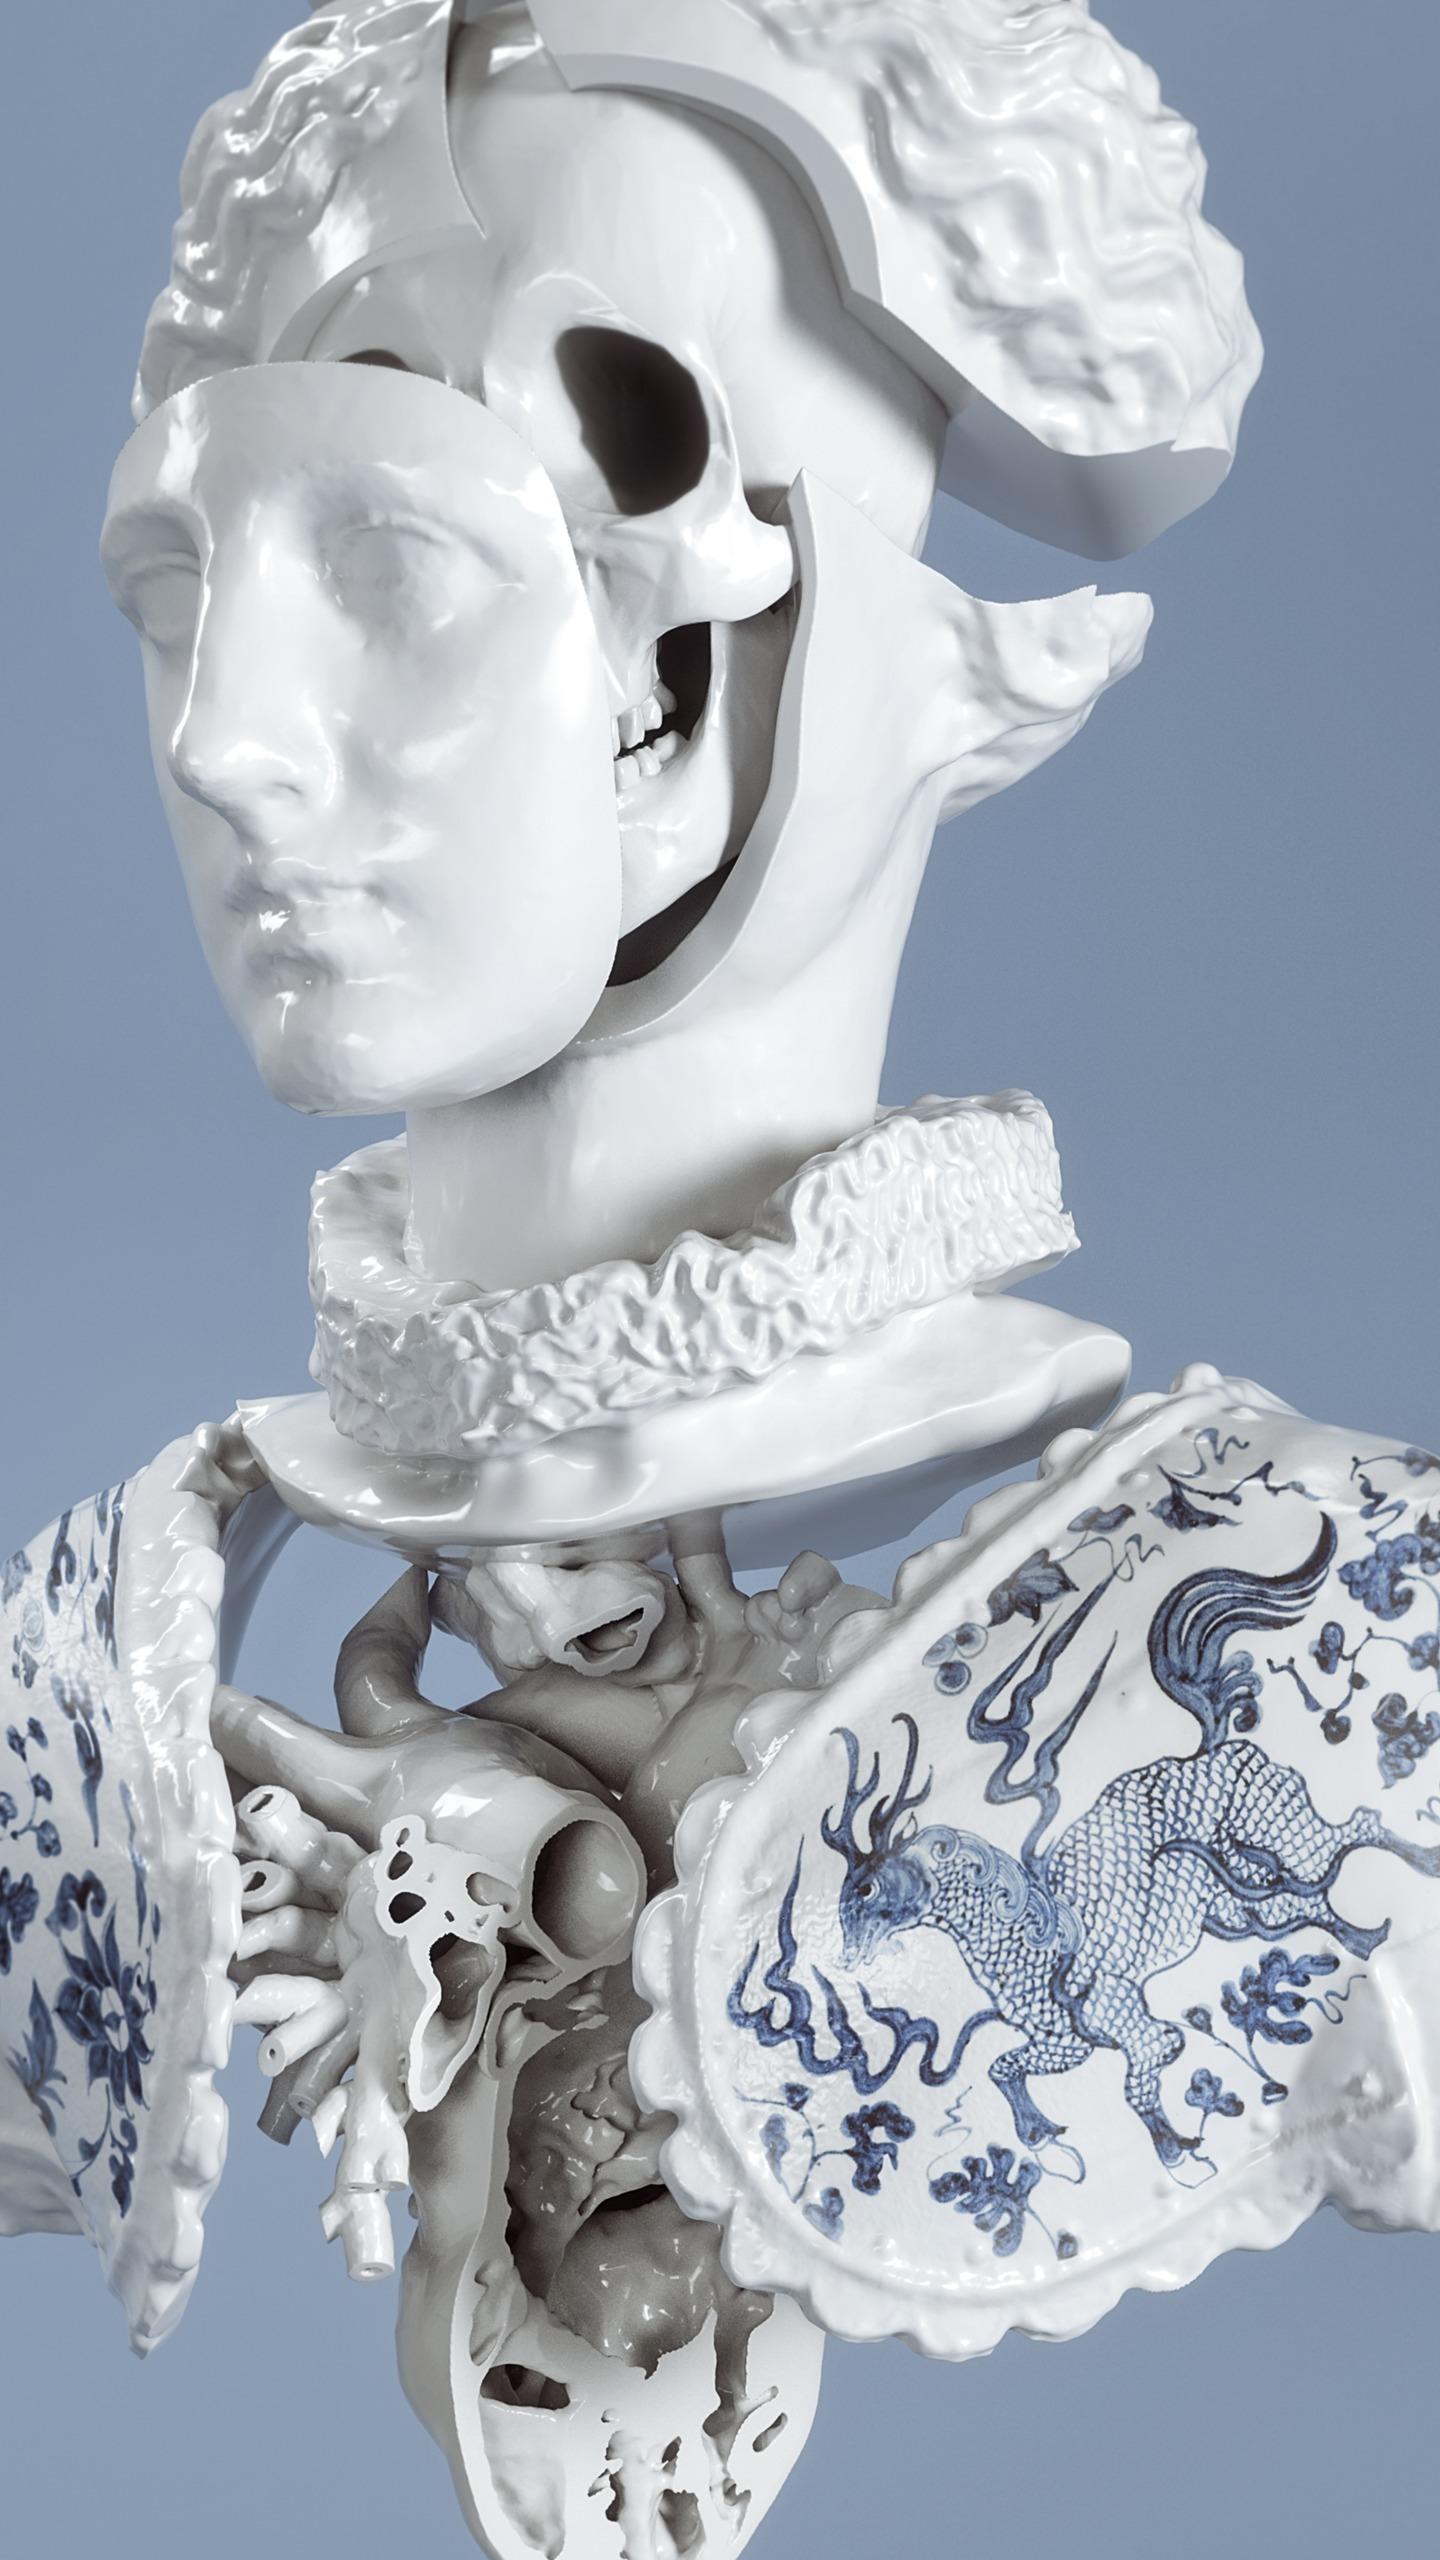 Luxury Problems 3D-bust illustr - hanneshummel | ello